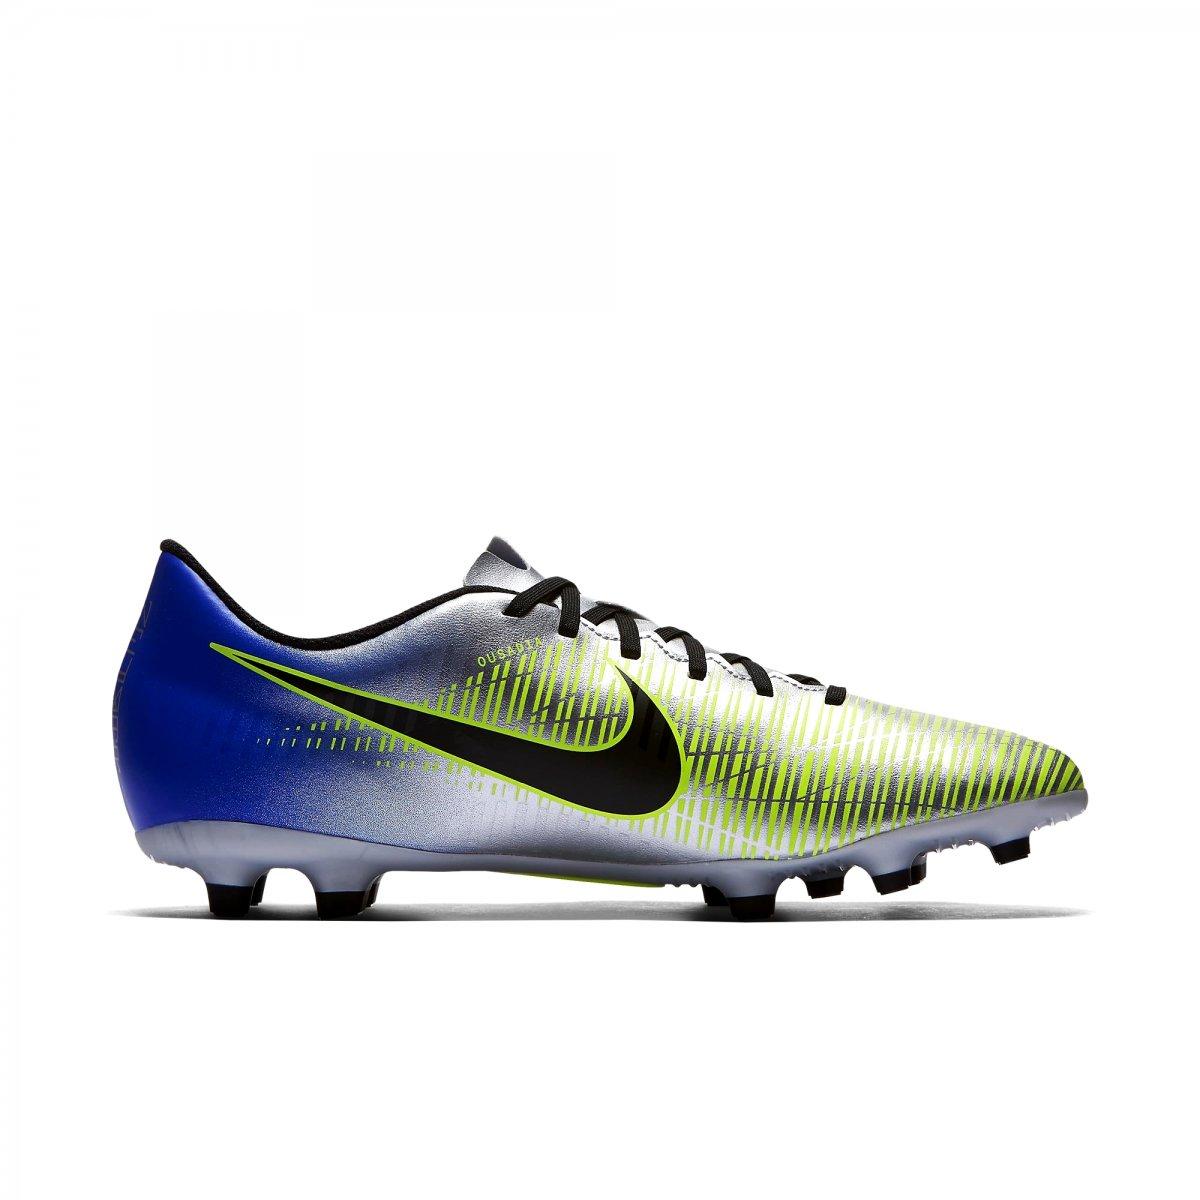 0b16d800f8 Chuteira Campo Nike Mercurial Vortex 3 Neymar 921511-407 - Prata ...